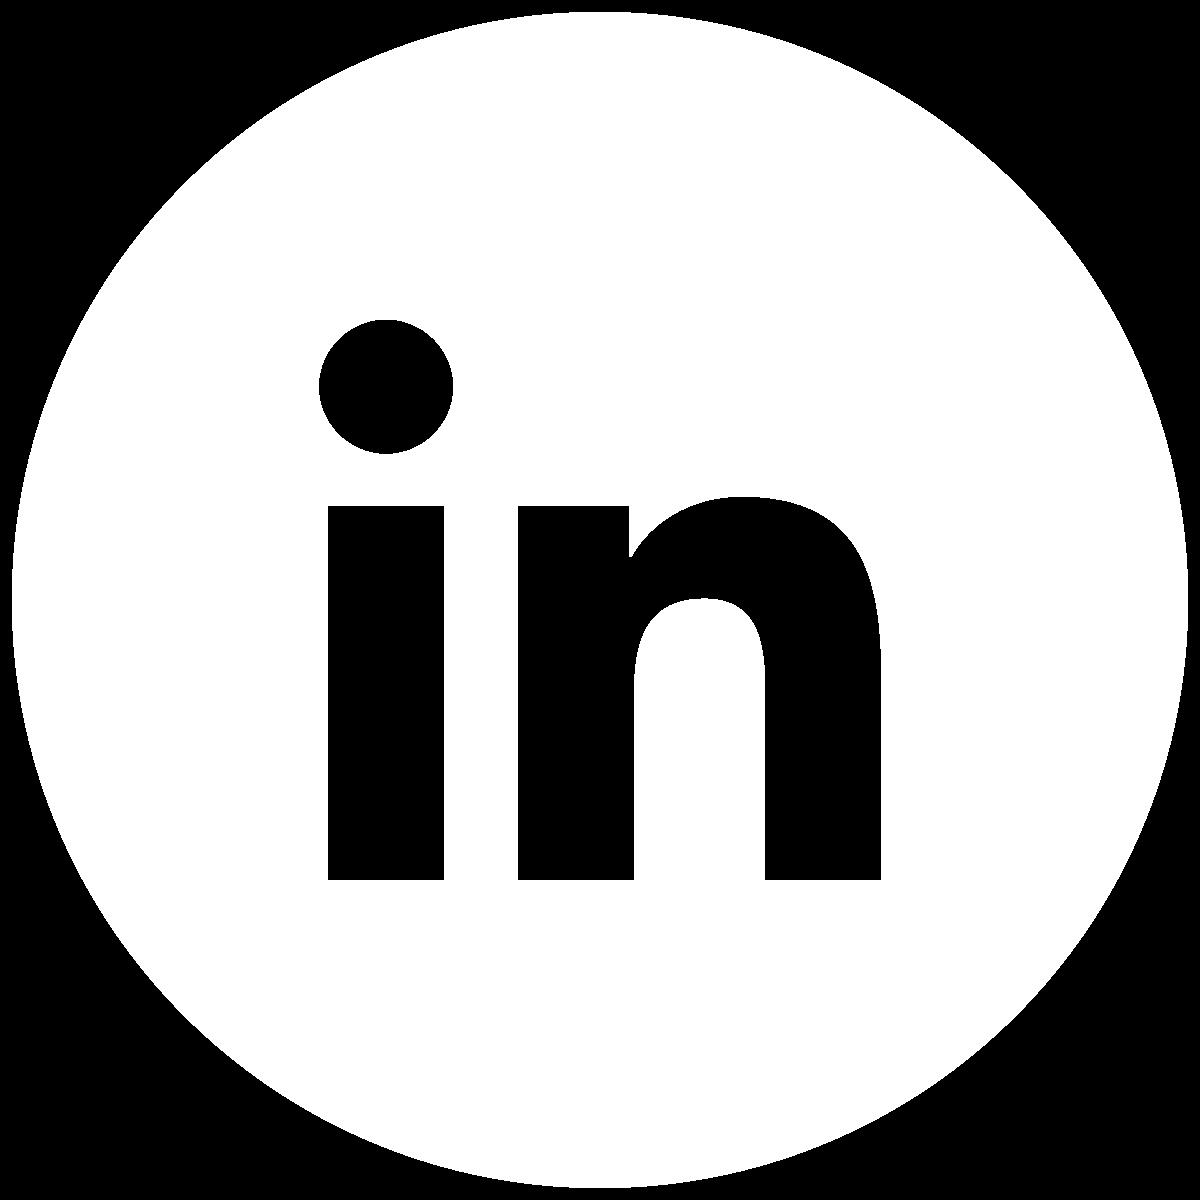 Kattotutka: LinkedIn